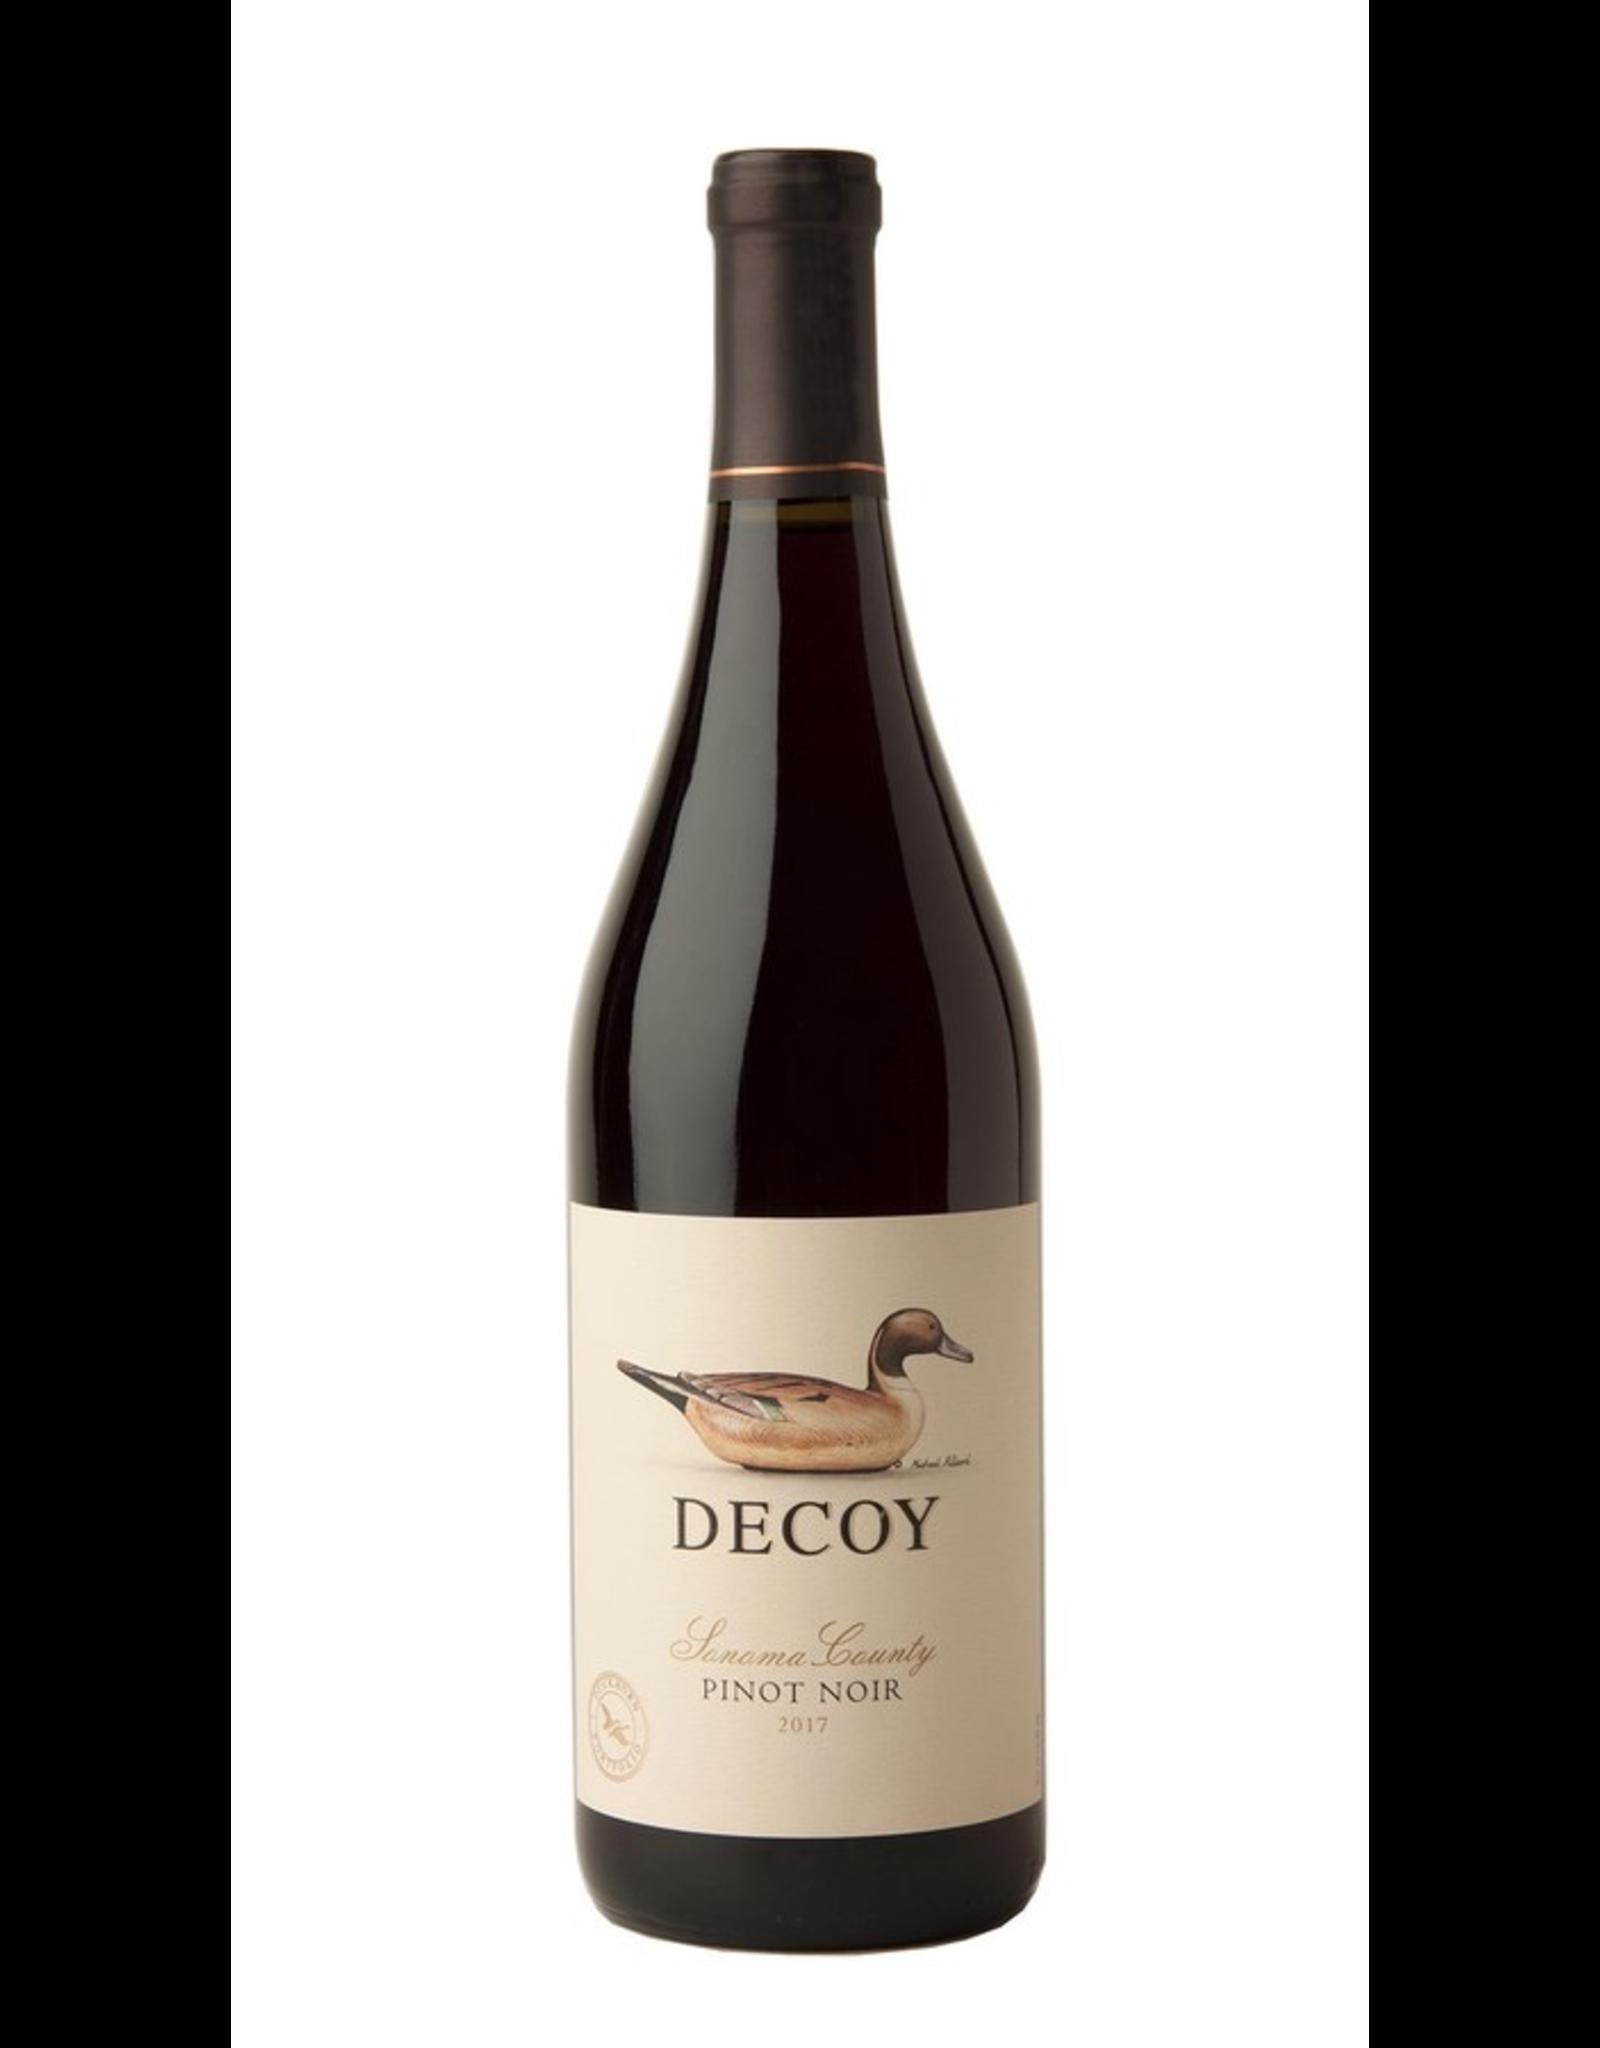 Red Wine 2018, Duckhorn Vineyards, Decoy, Pinot Noir, Sonoma County, California, USA, 14.1% Alc, CT89.5, TW89